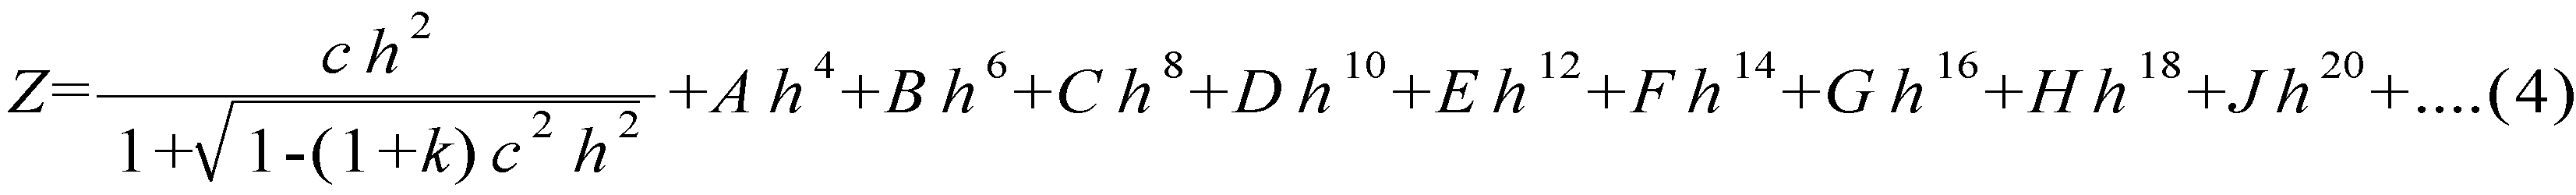 Figure 112004007174579-pat00004